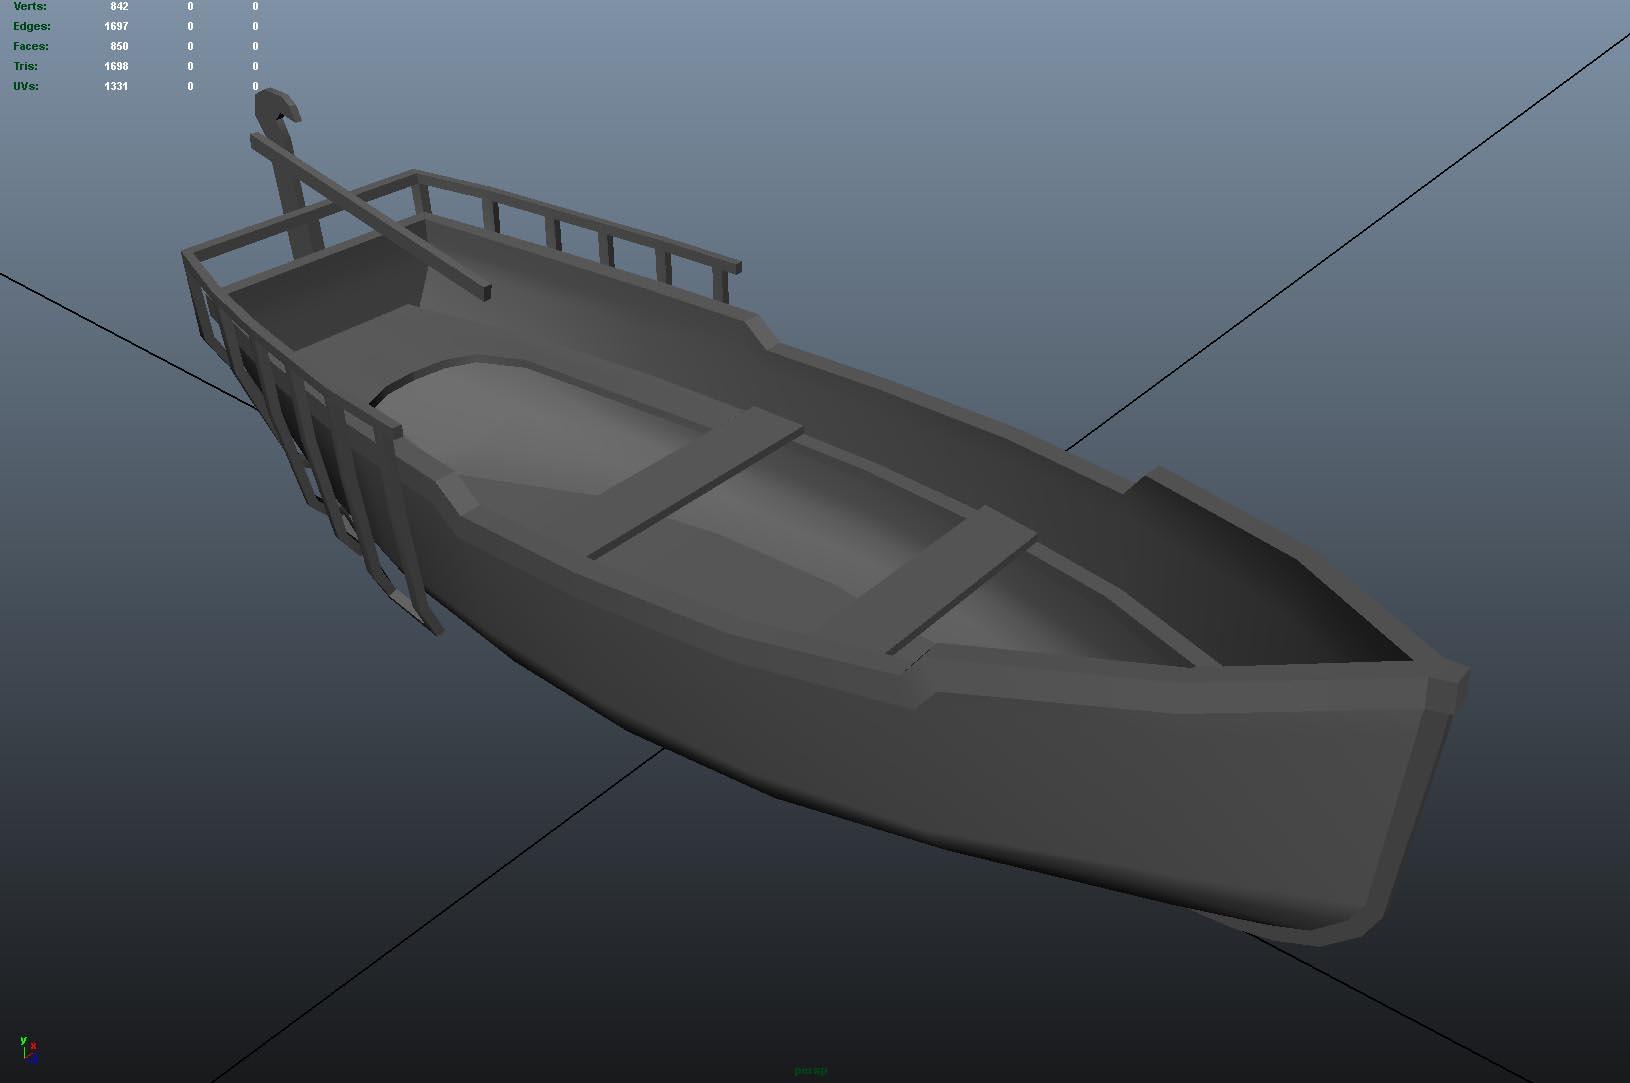 Pirate_Rowboat_Shaded.jpg